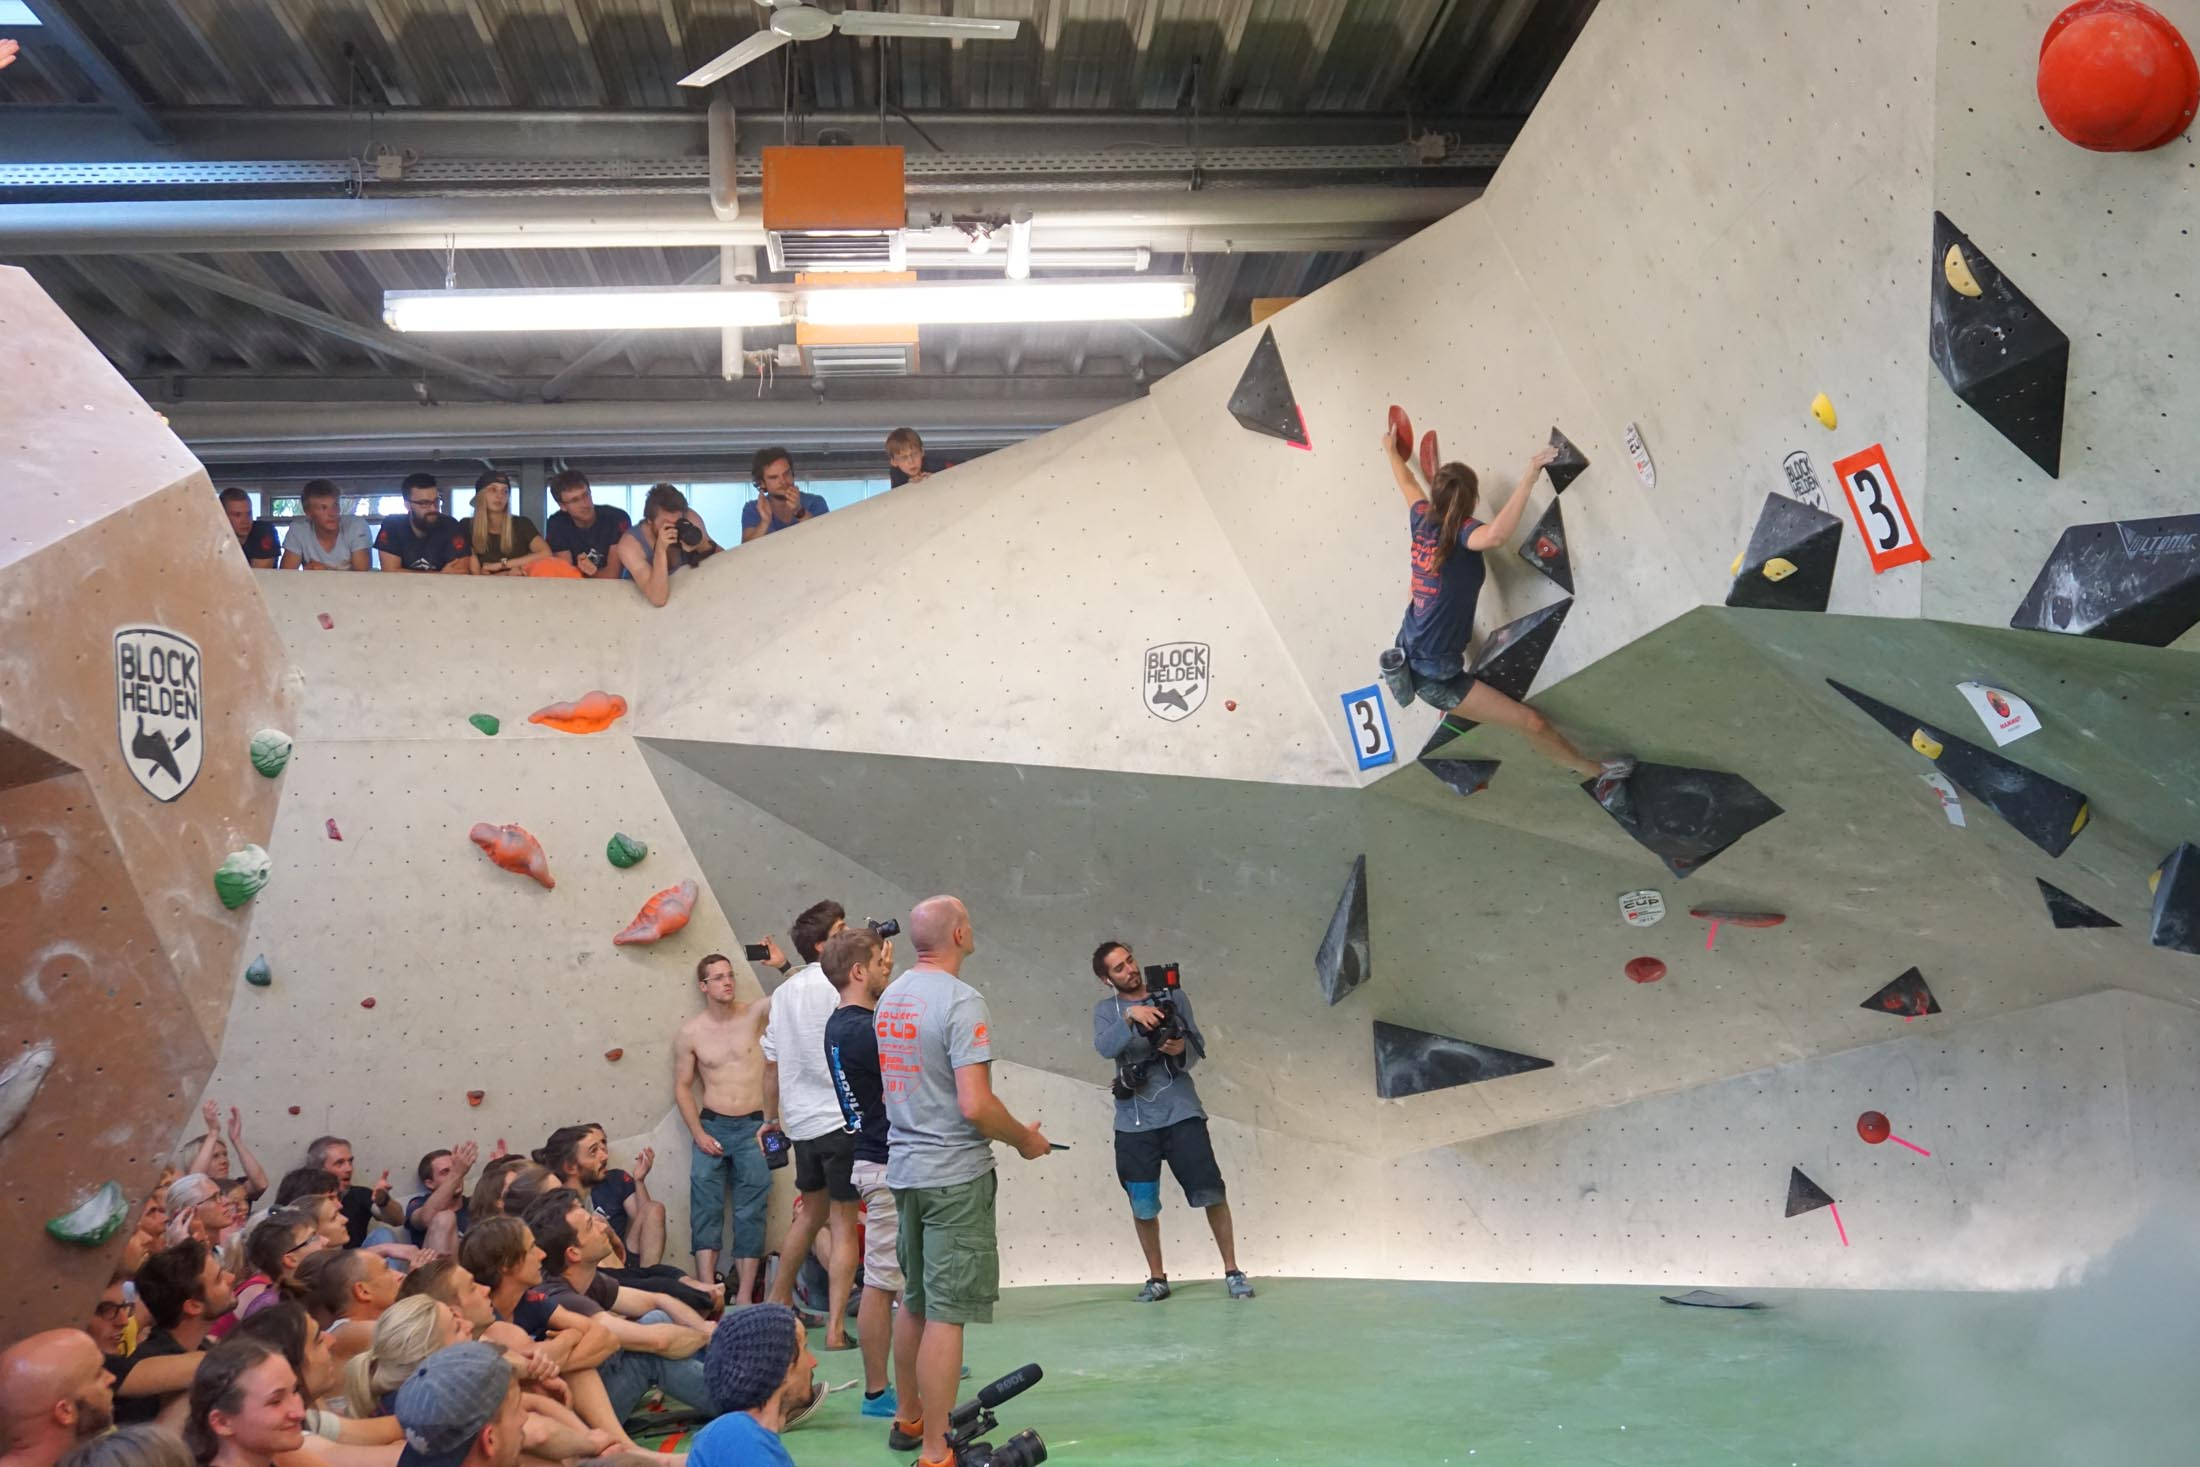 Finale, internationaler bouldercup Frankenjura 2016, BLOCKHELDEN Erlangen, Mammut, Bergfreunde.de, Boulderwettkampf07092016688